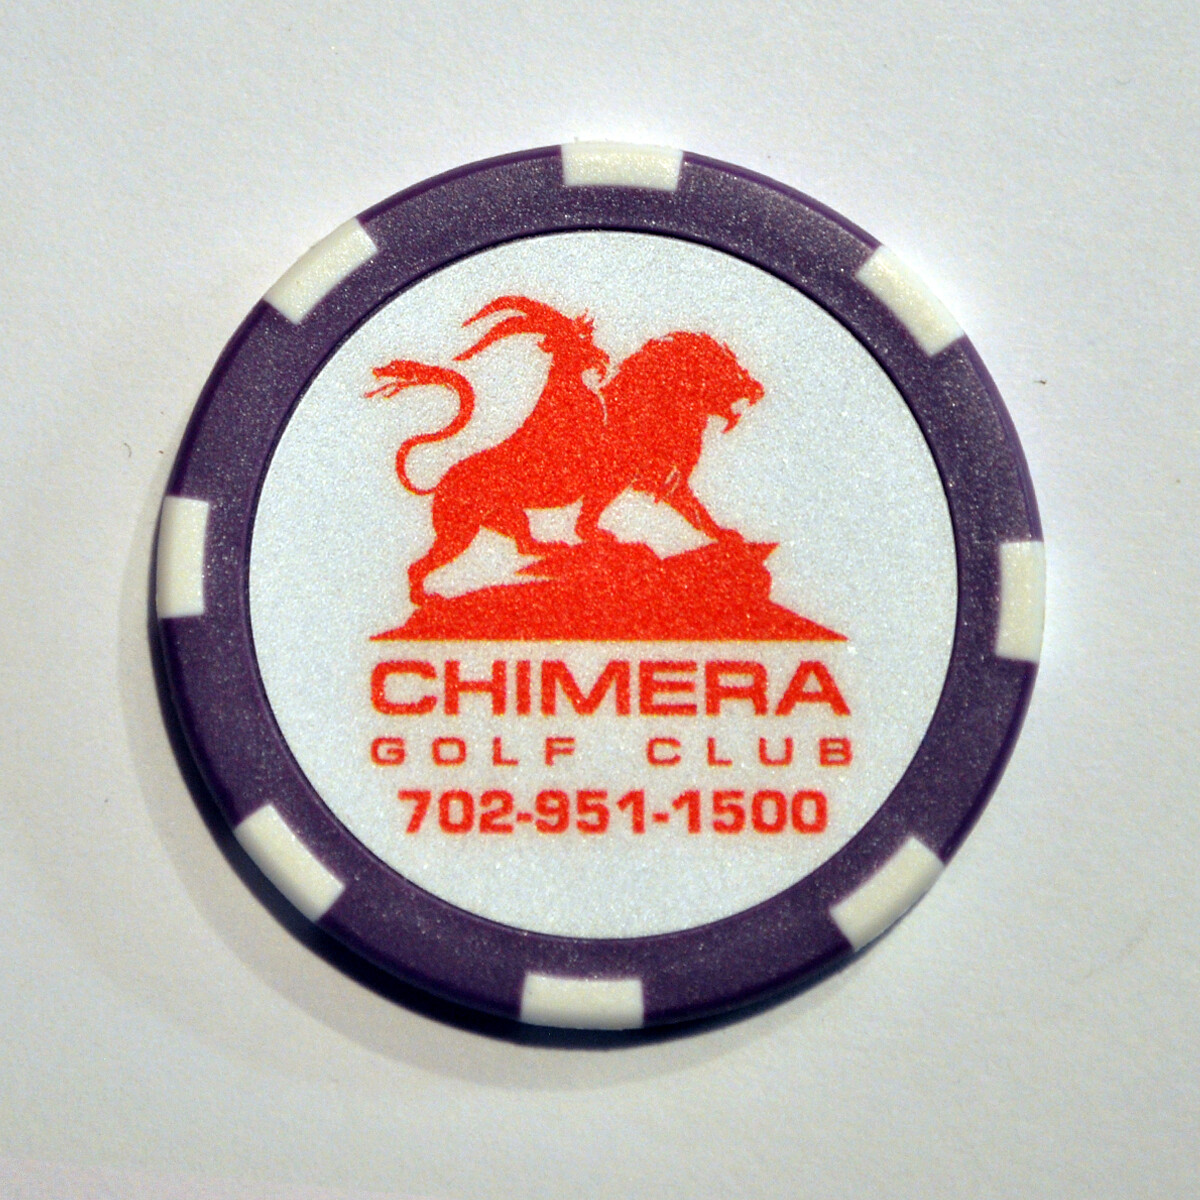 Poker Chip - Chimera - Purple/White